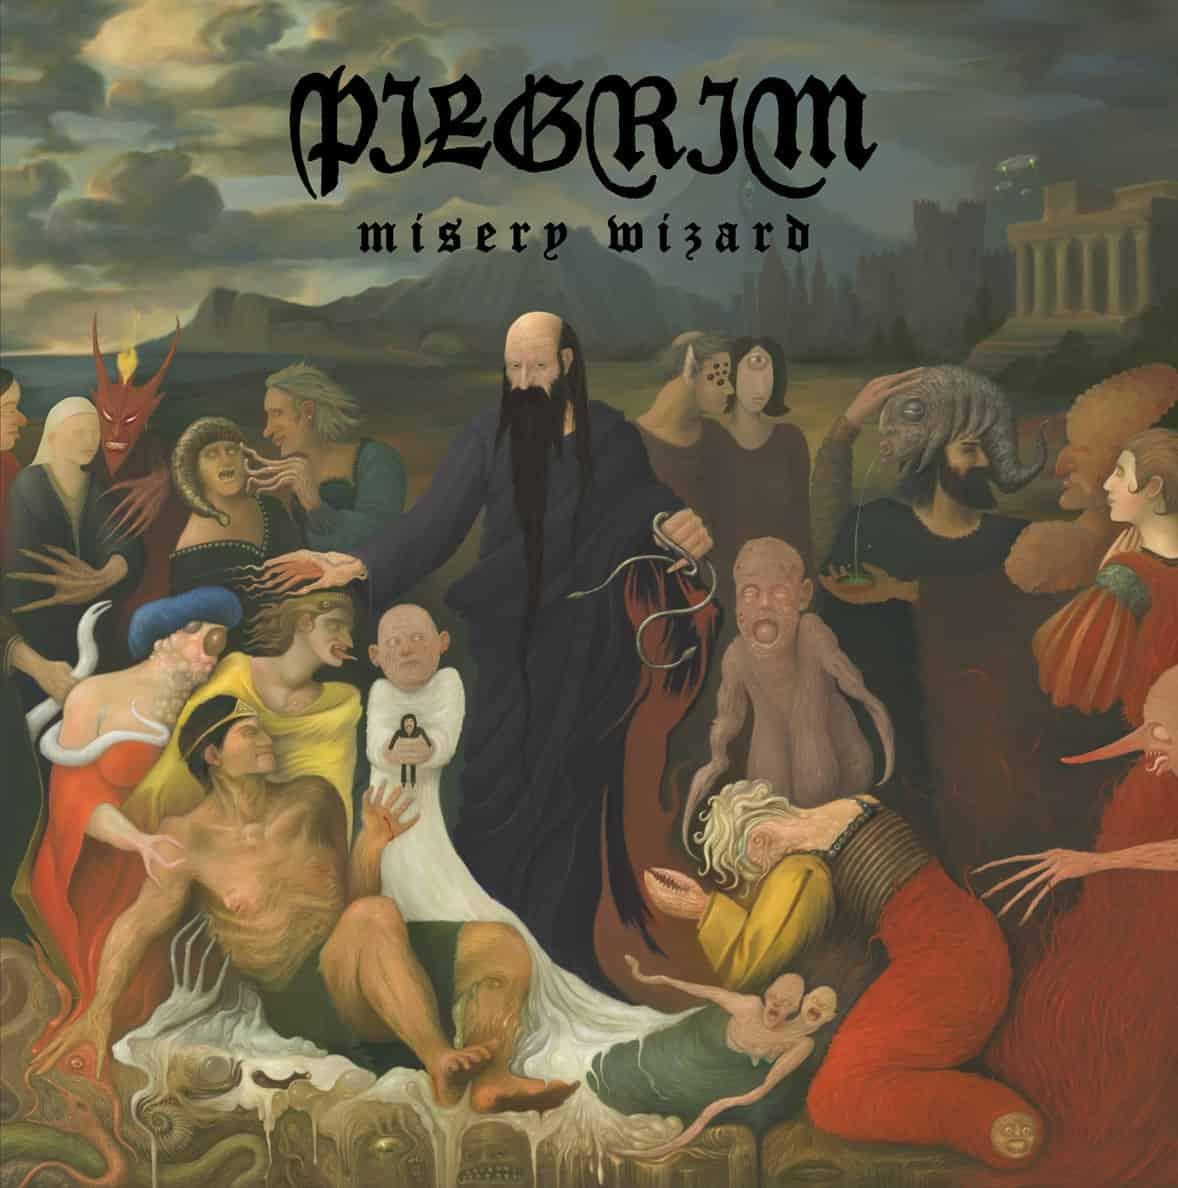 Pilgrim - Misery Wizard Cover